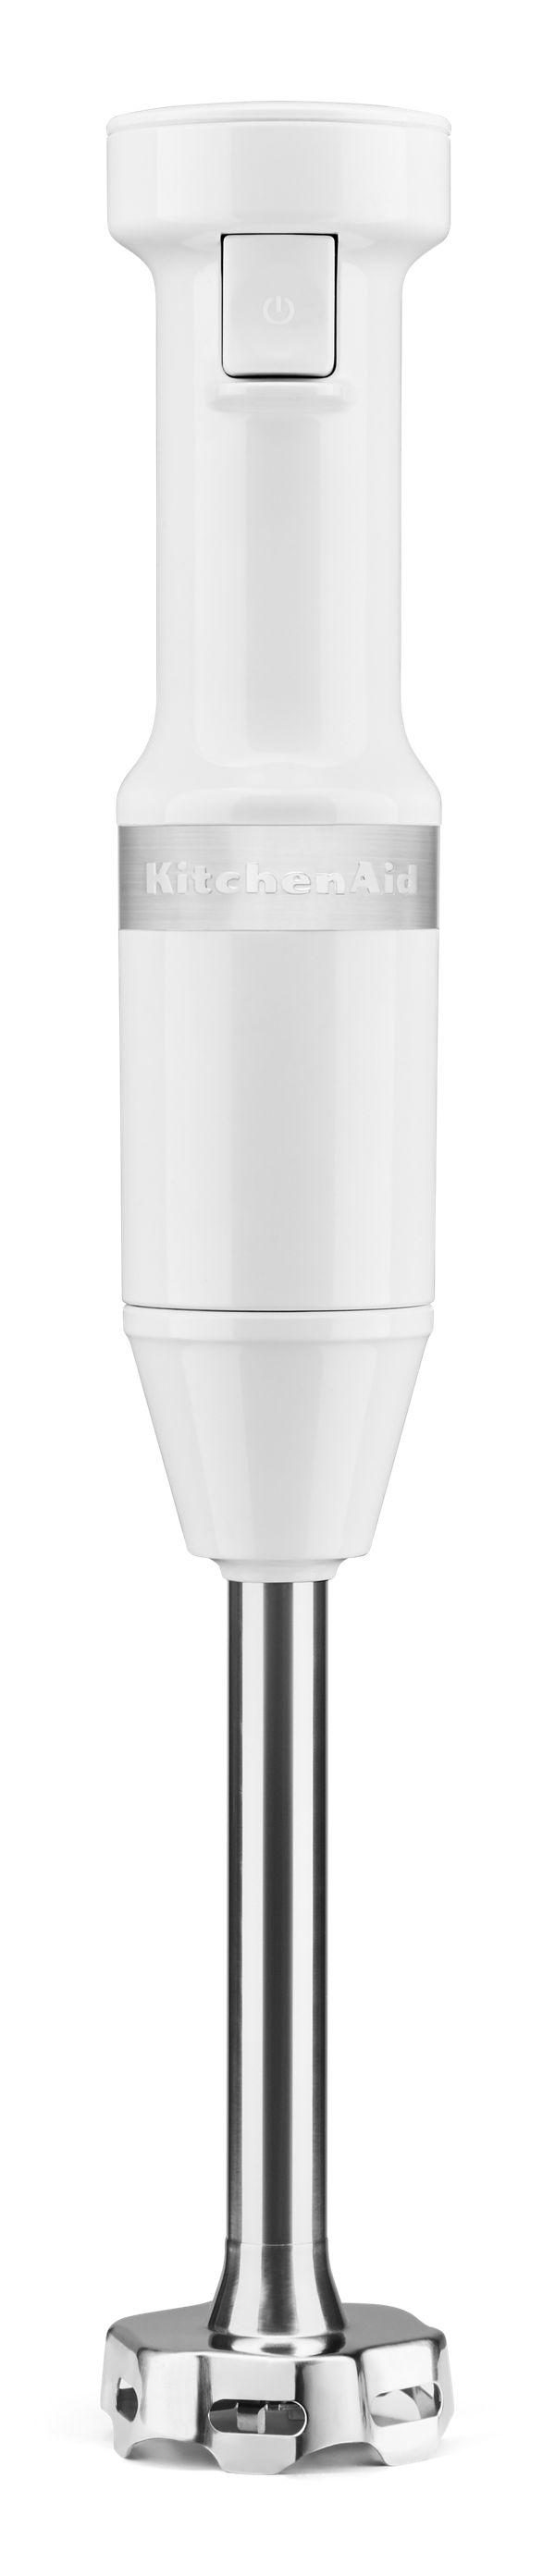 KitchenAid® Variable Speed Corded Hand Blender